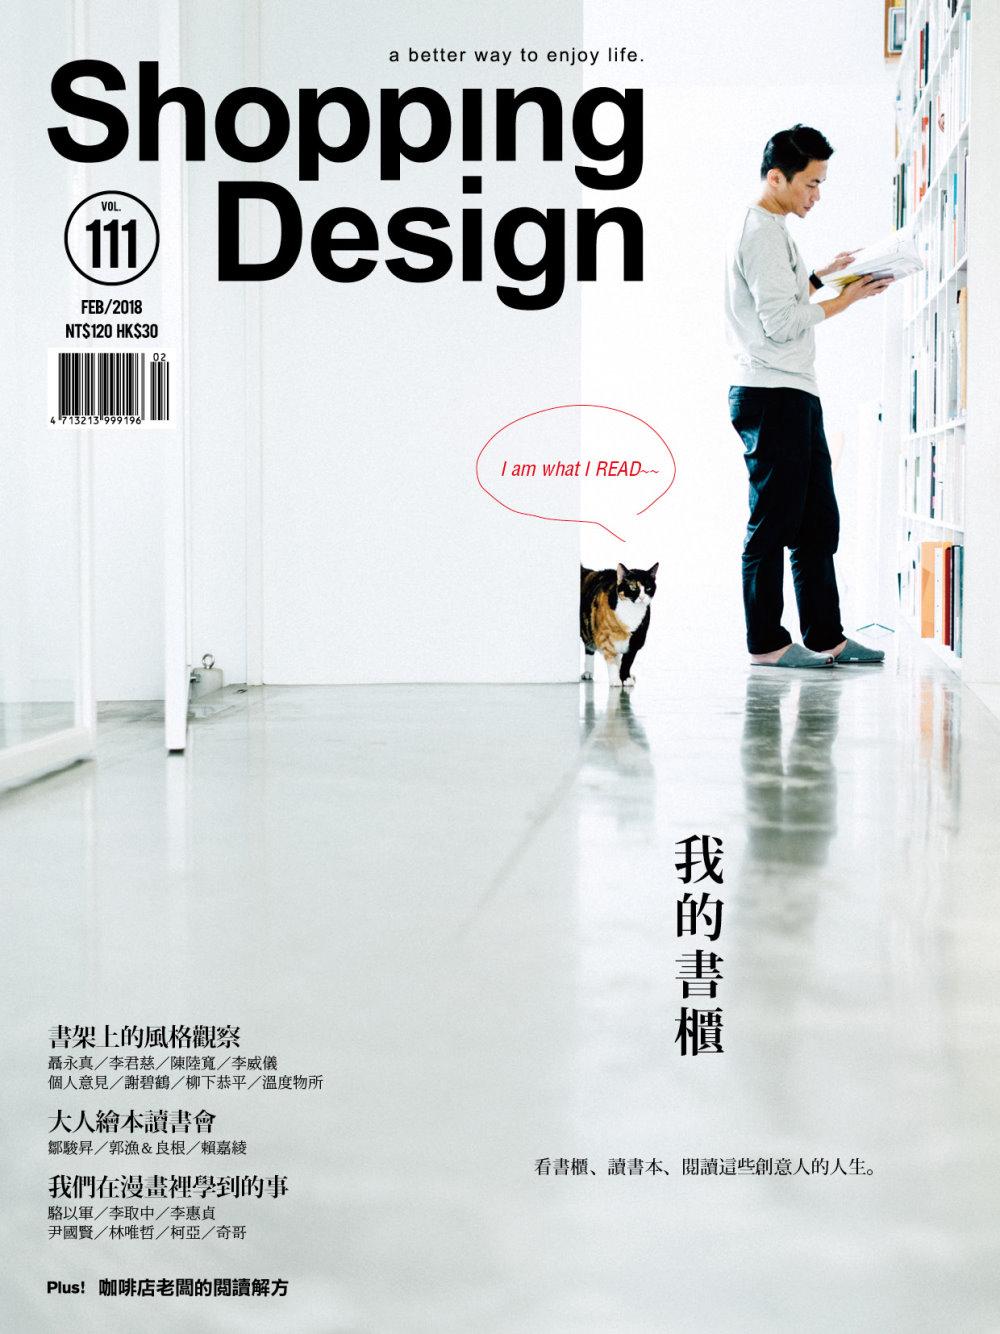 Shopping Design設計採買誌二年24期 +精選套書:《刻意練習》、《大前研一「從0到1」的發想術》、《你要如何衡量你的人生》